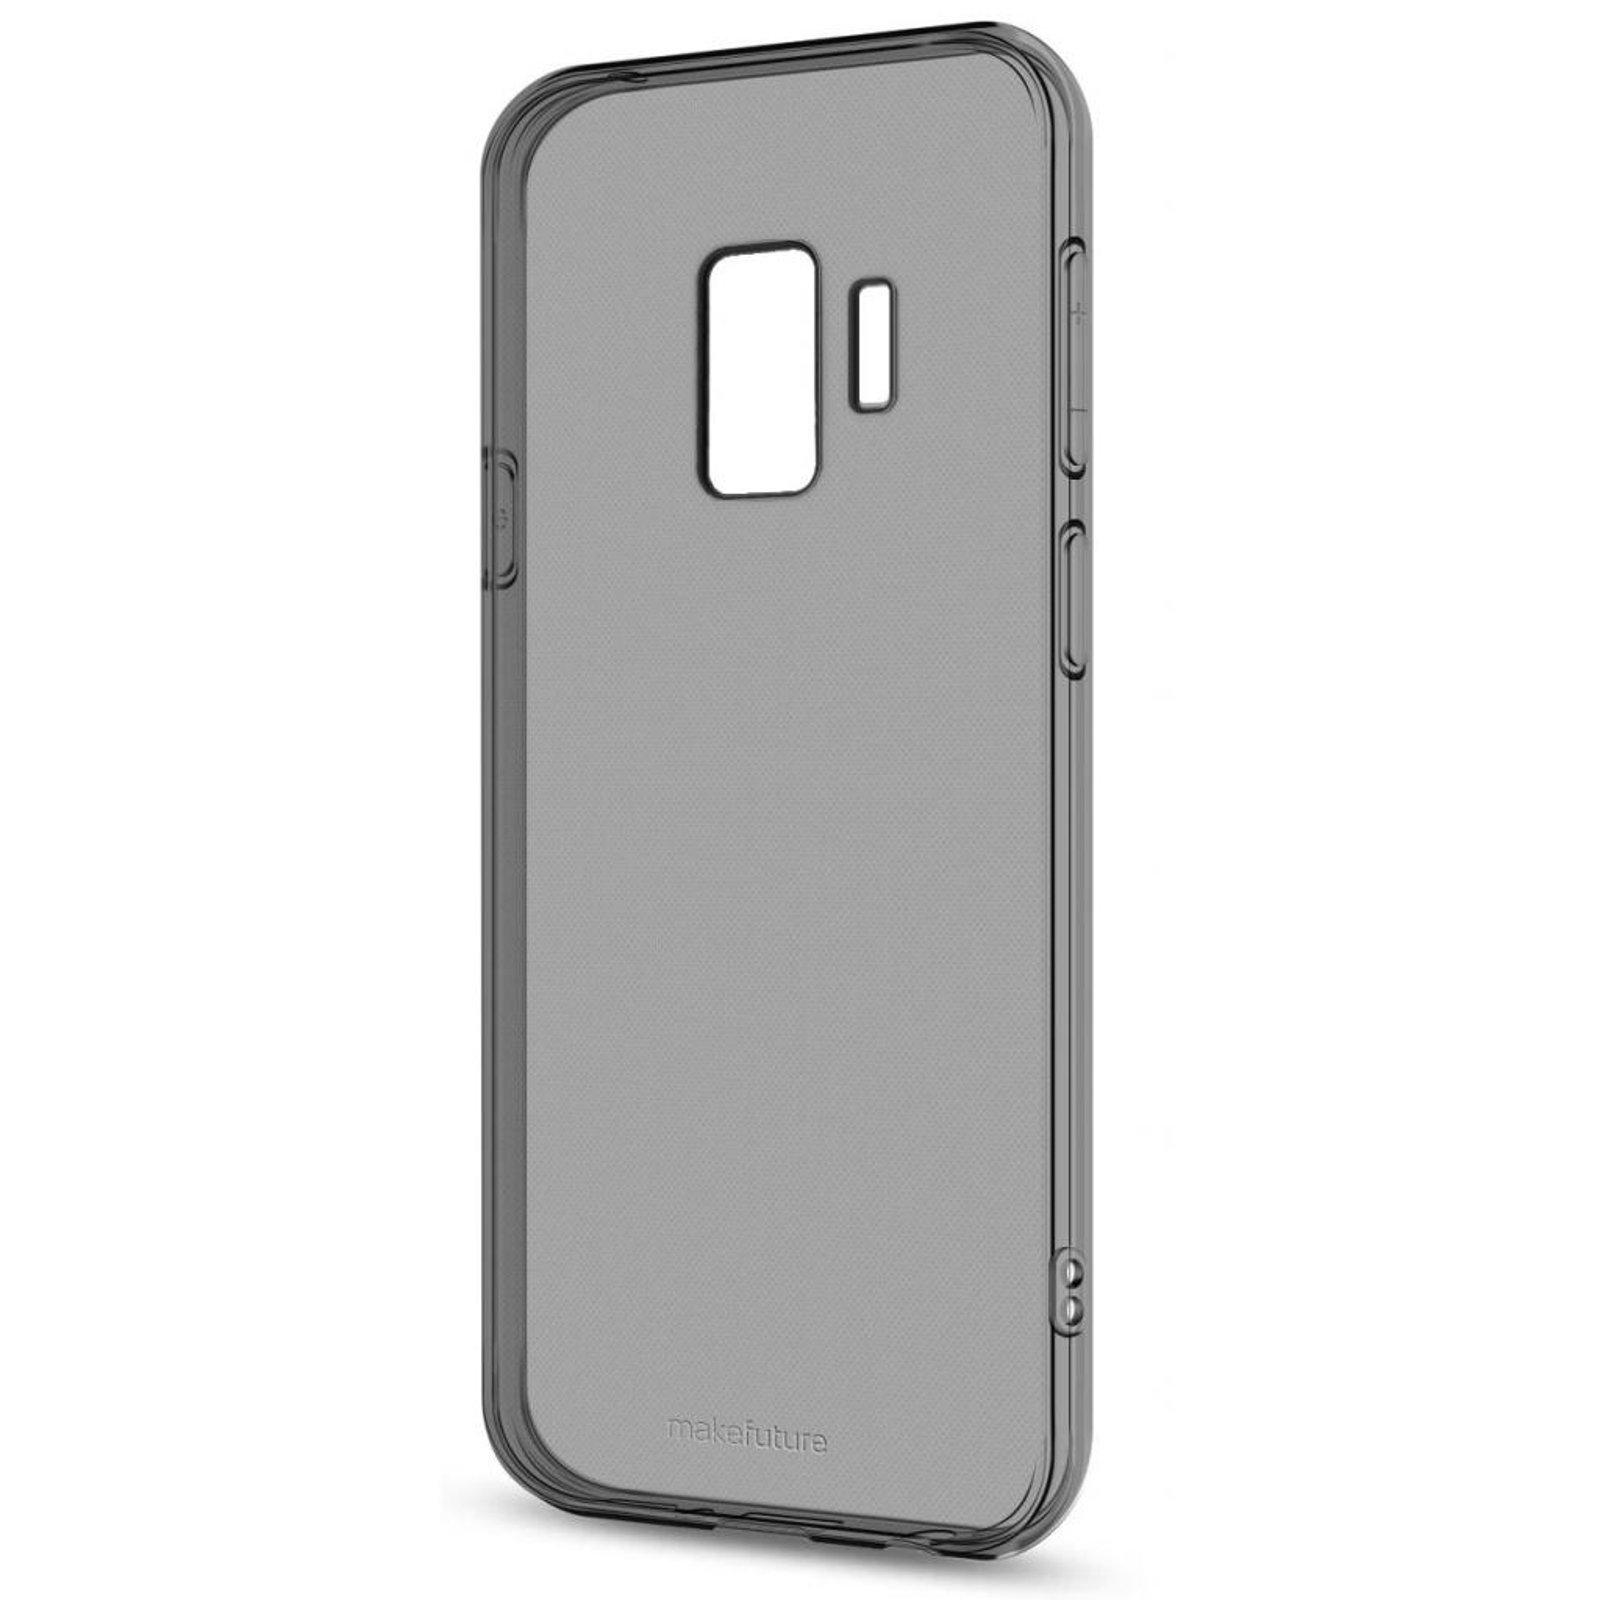 Чехол для моб. телефона MakeFuture Air Case (TPU) Samsung S8 Black (MCA-SS8BK)